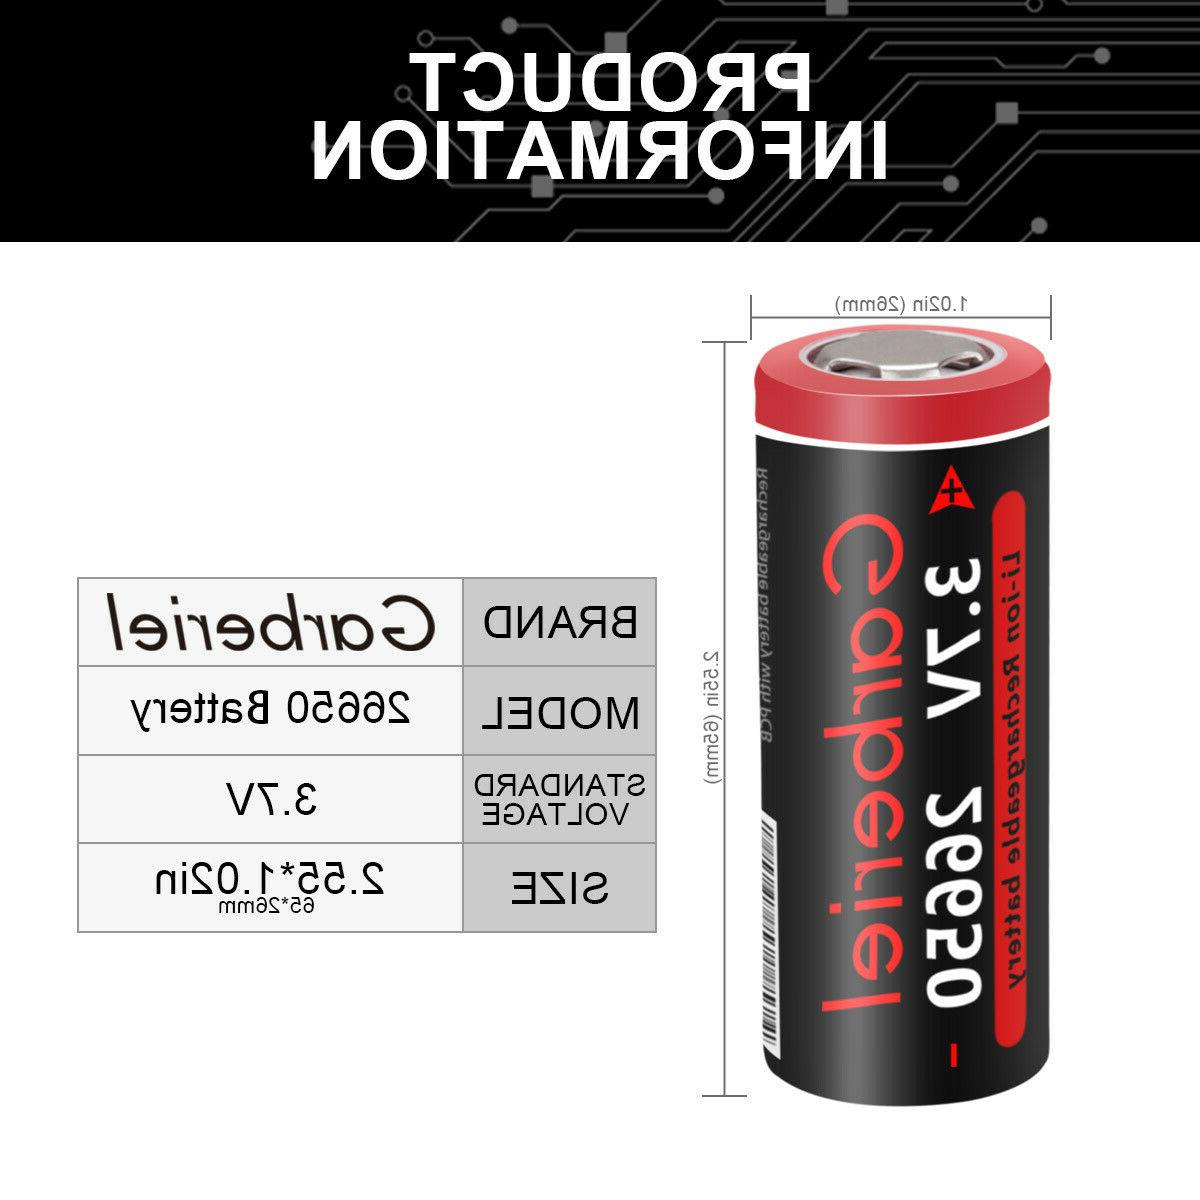 26650 Battery Flashlight Torch